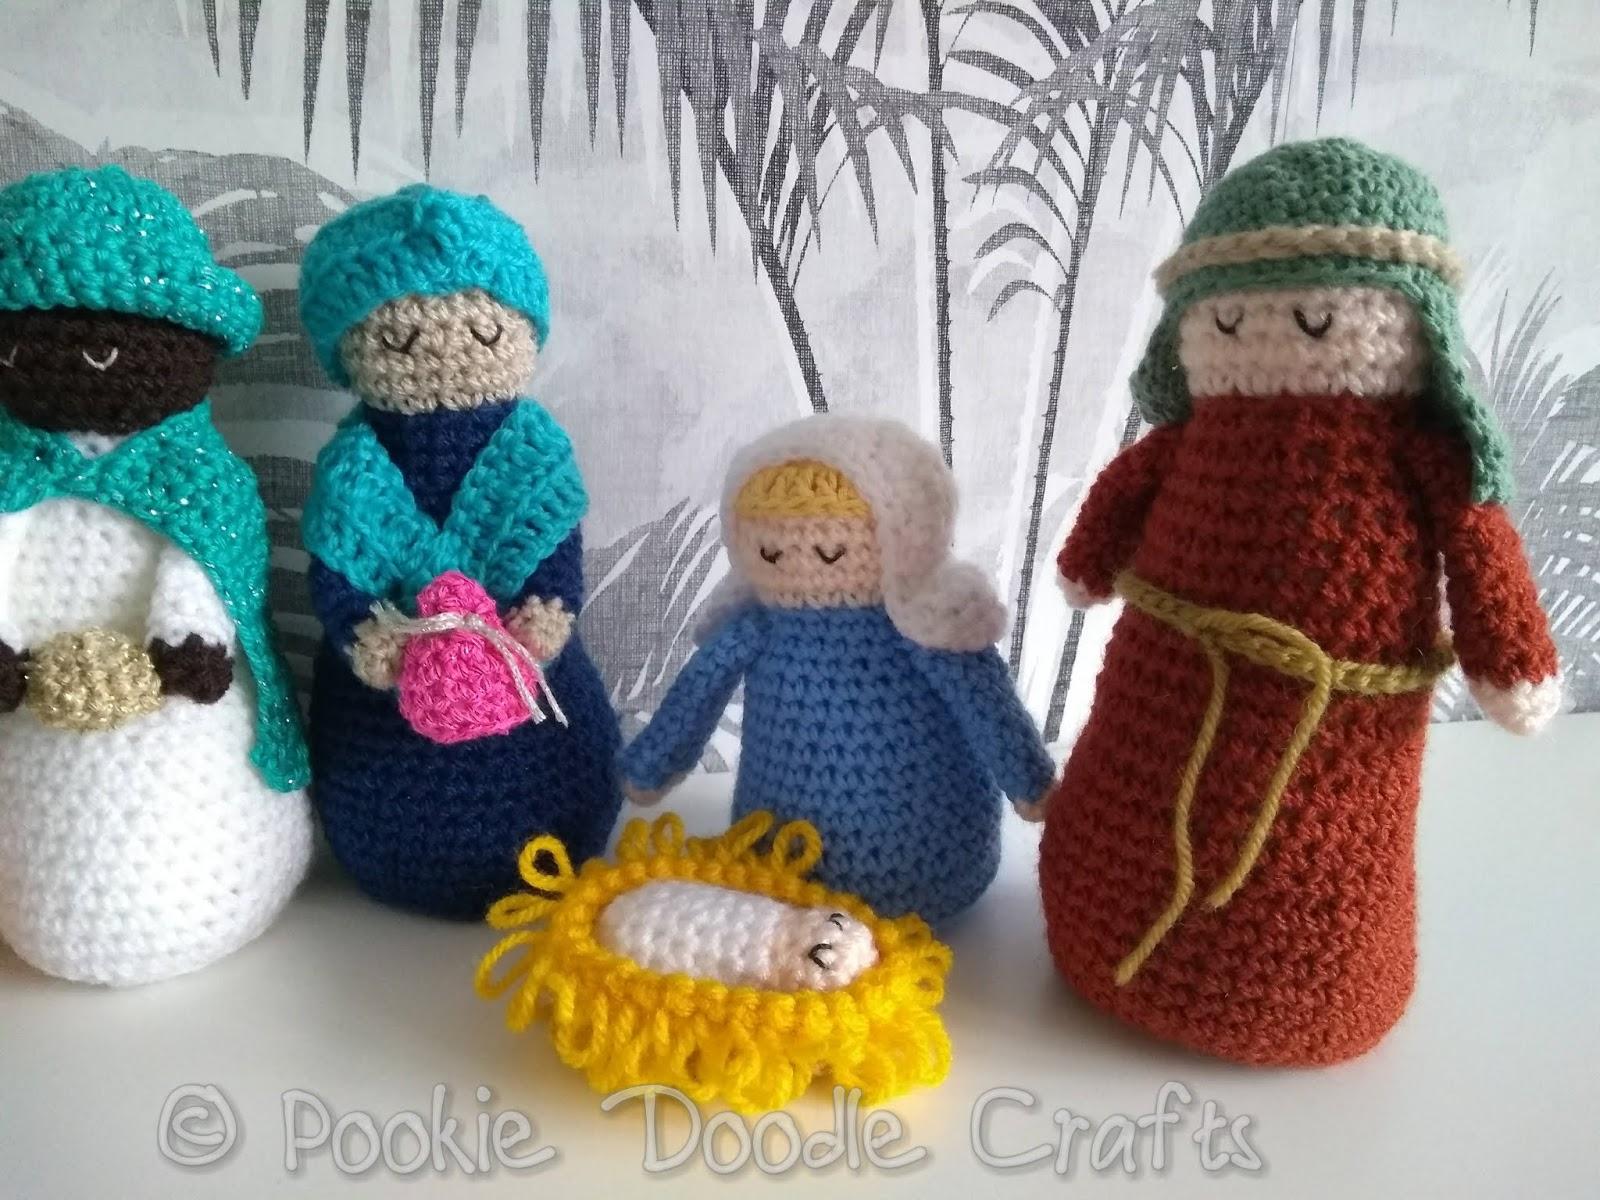 Crochet Nativity Set - Free Crochet Pattern | 1200x1600